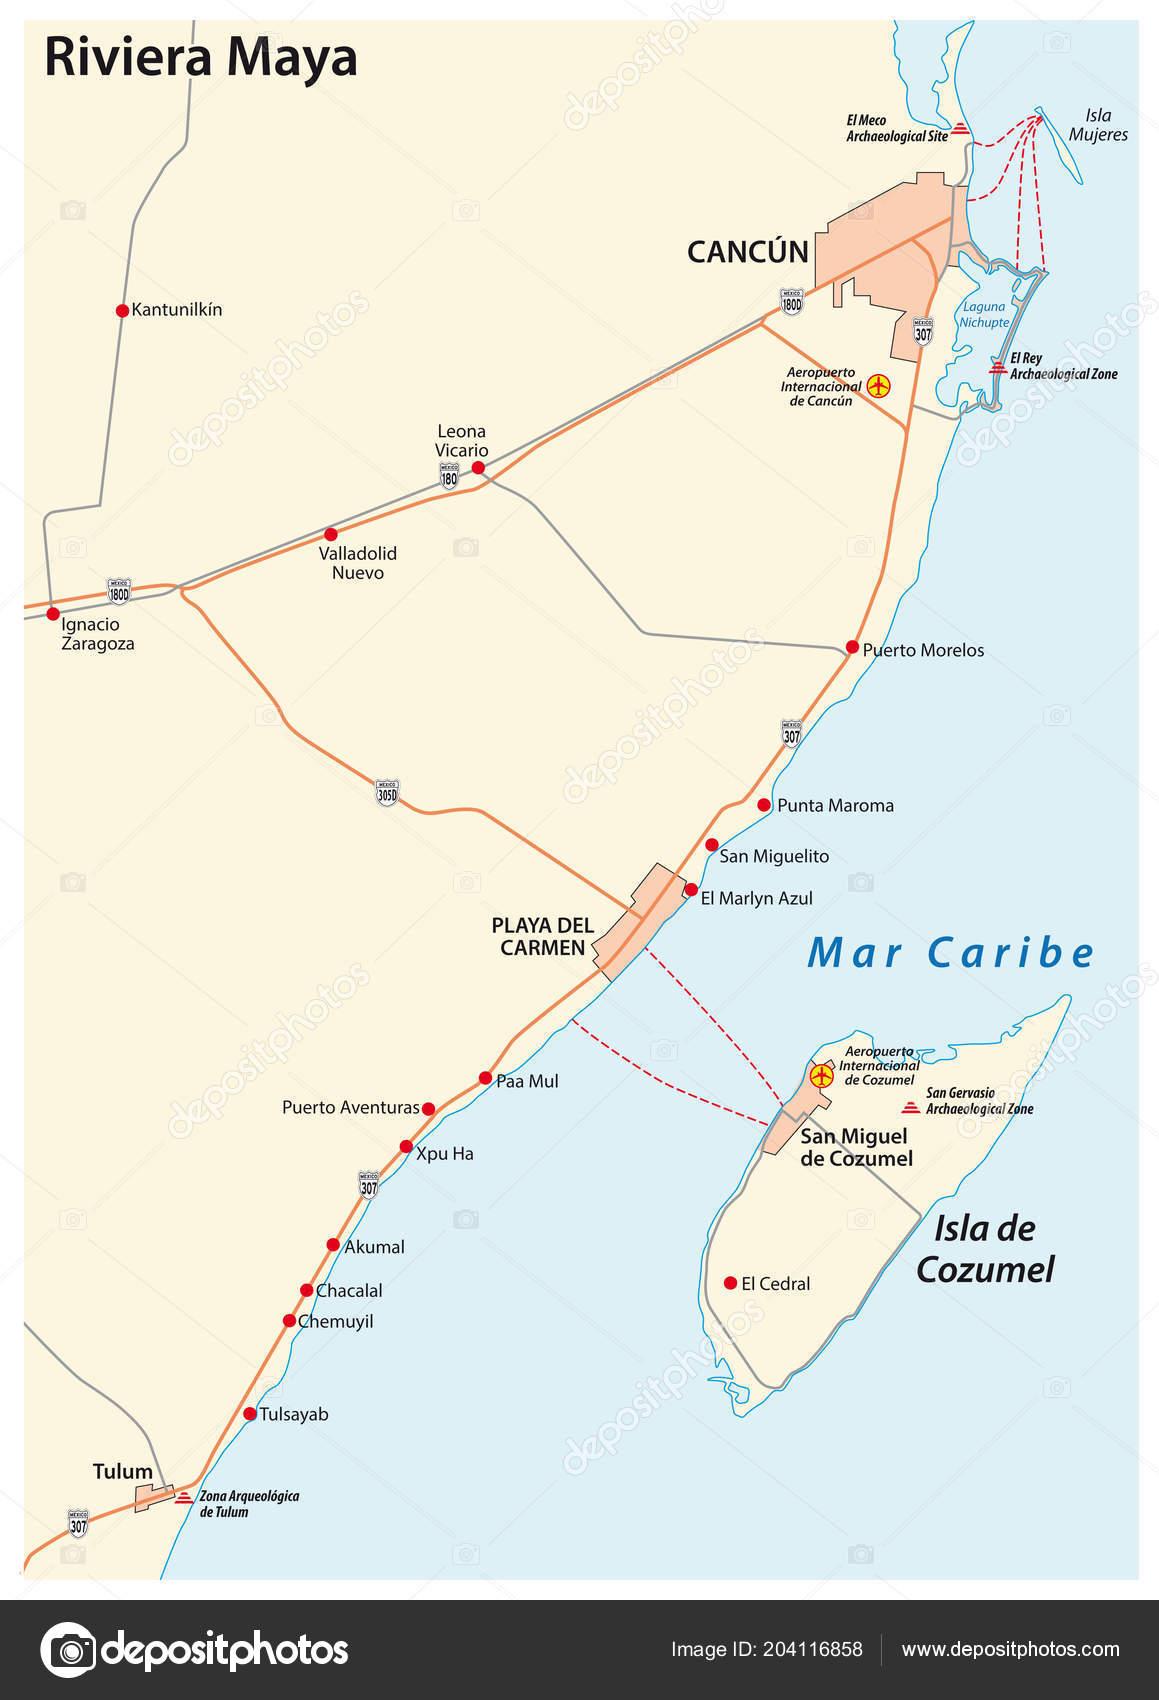 Riviera Maya Road Vector Map Quintana Roo Mexico — Stock Vector ...